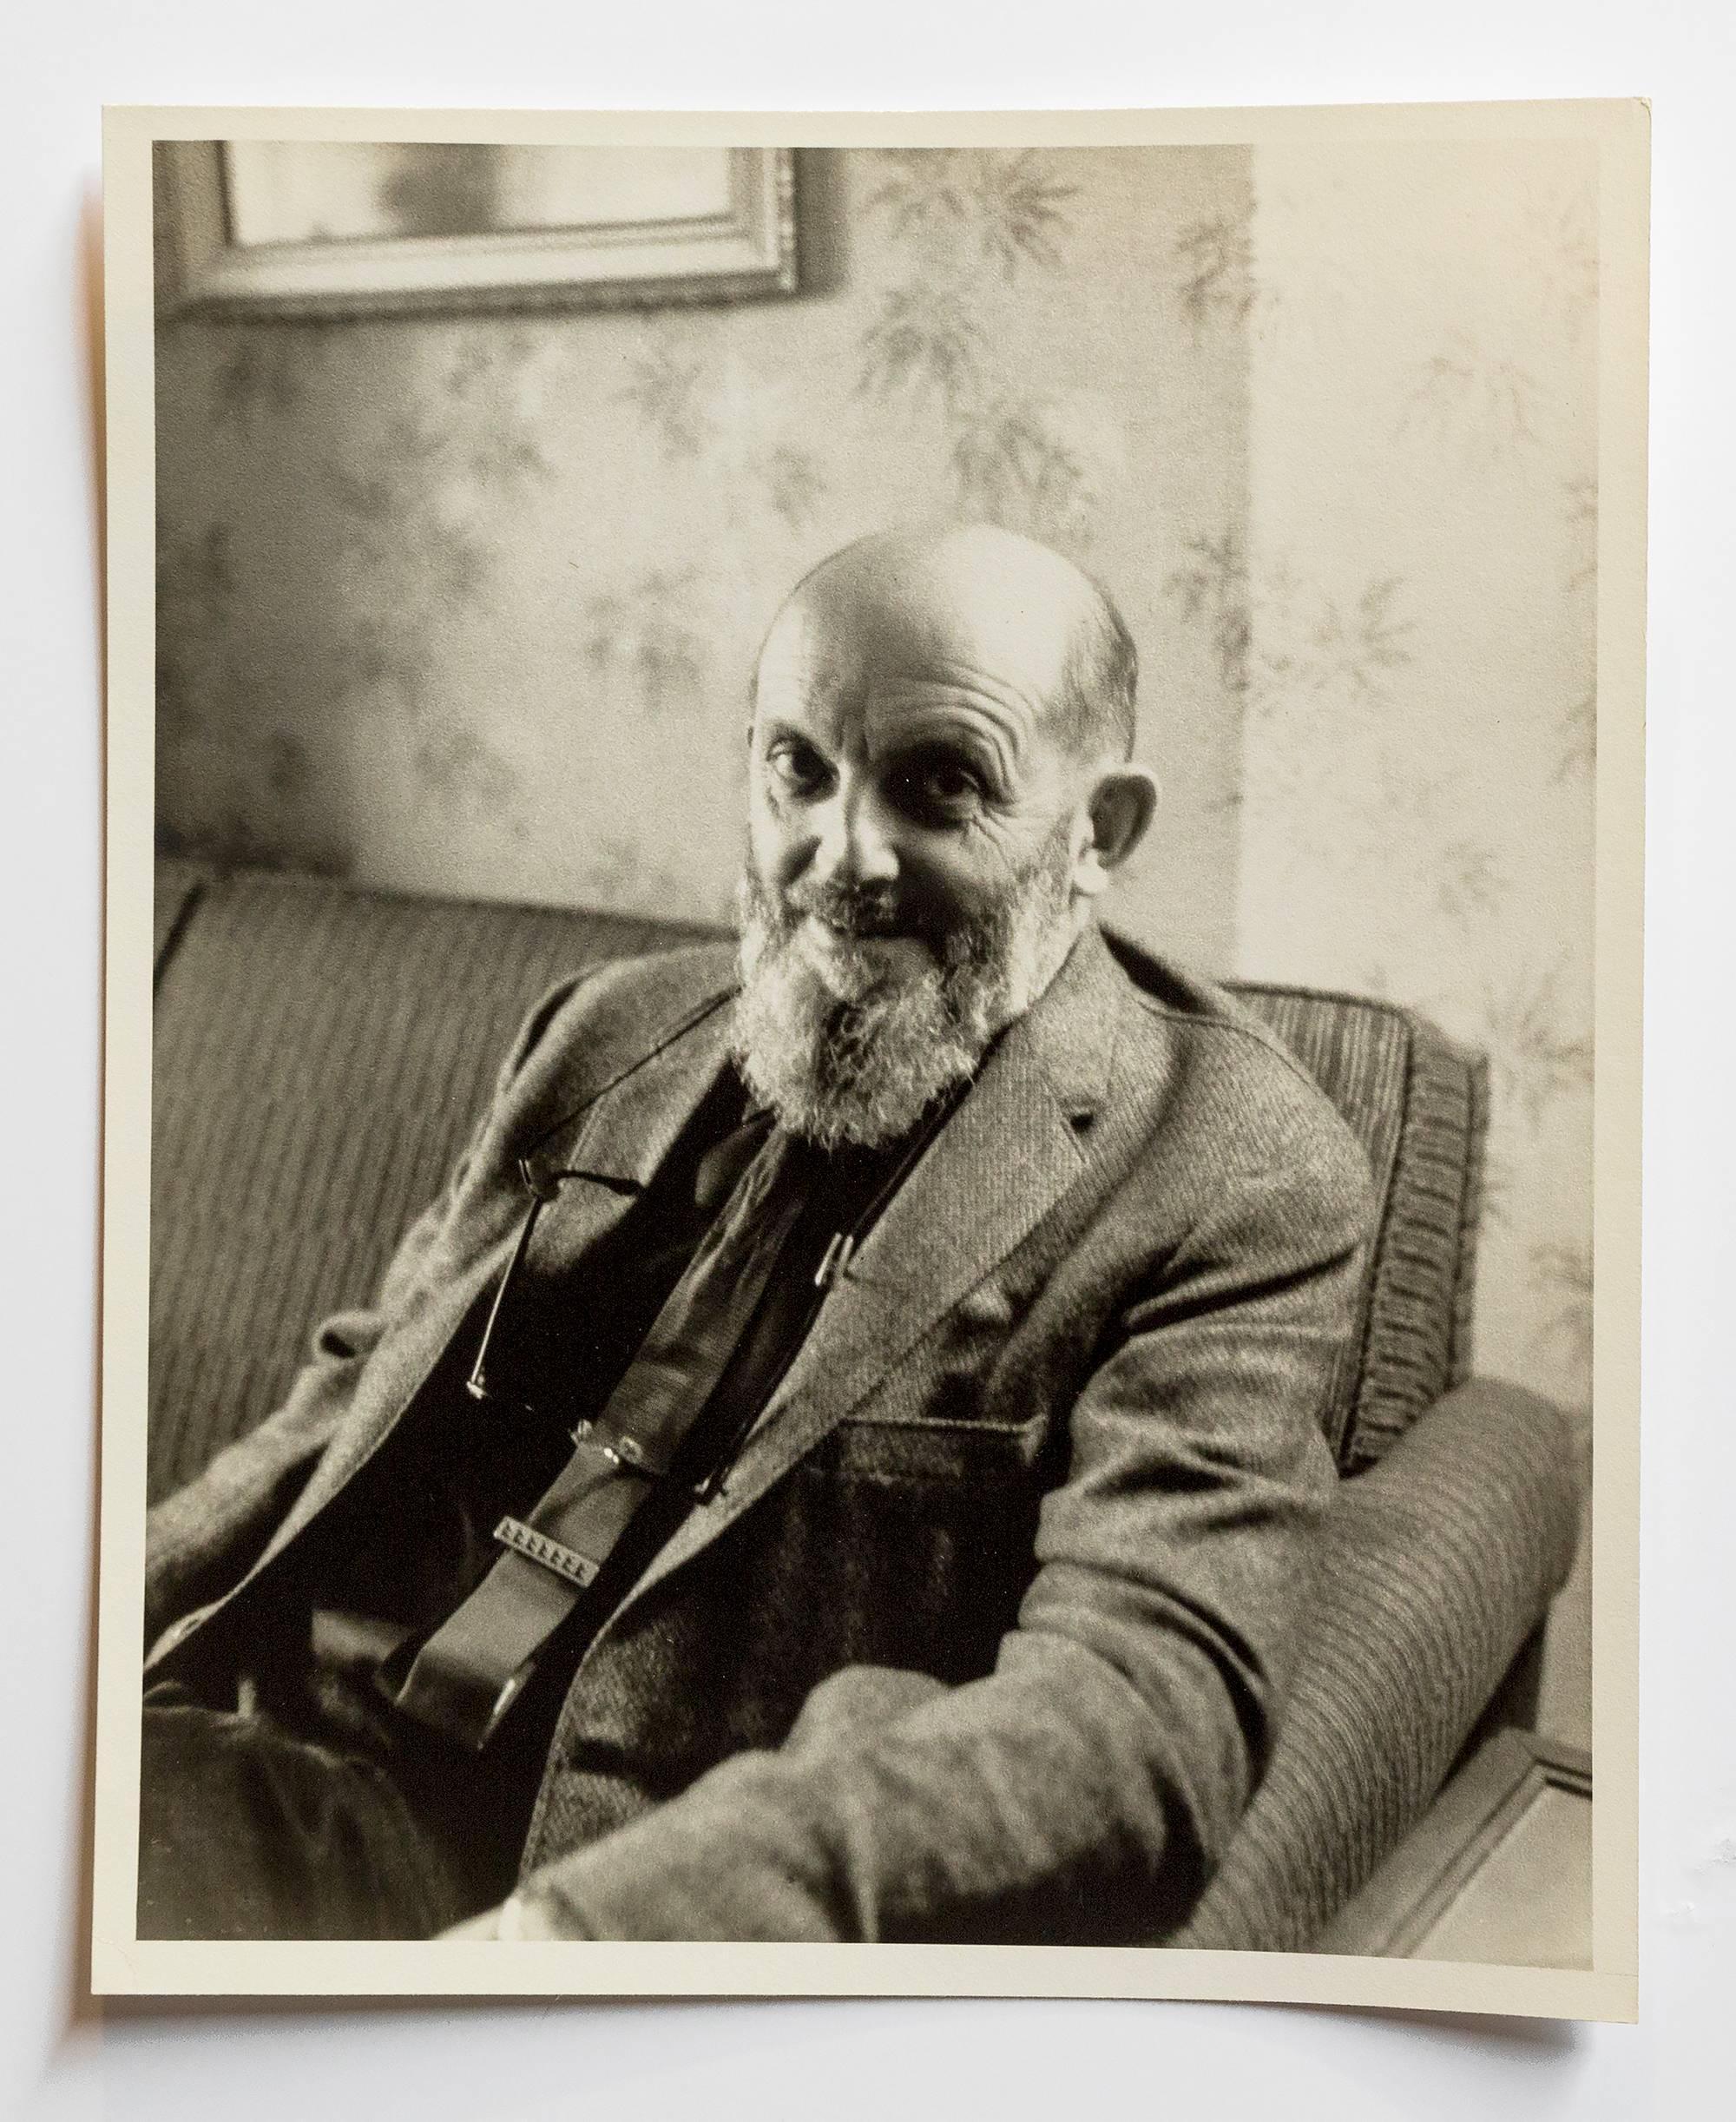 Rare Vintage Silver Gelatin and Polaroid Photograph Prints Ansel Adams Portrait